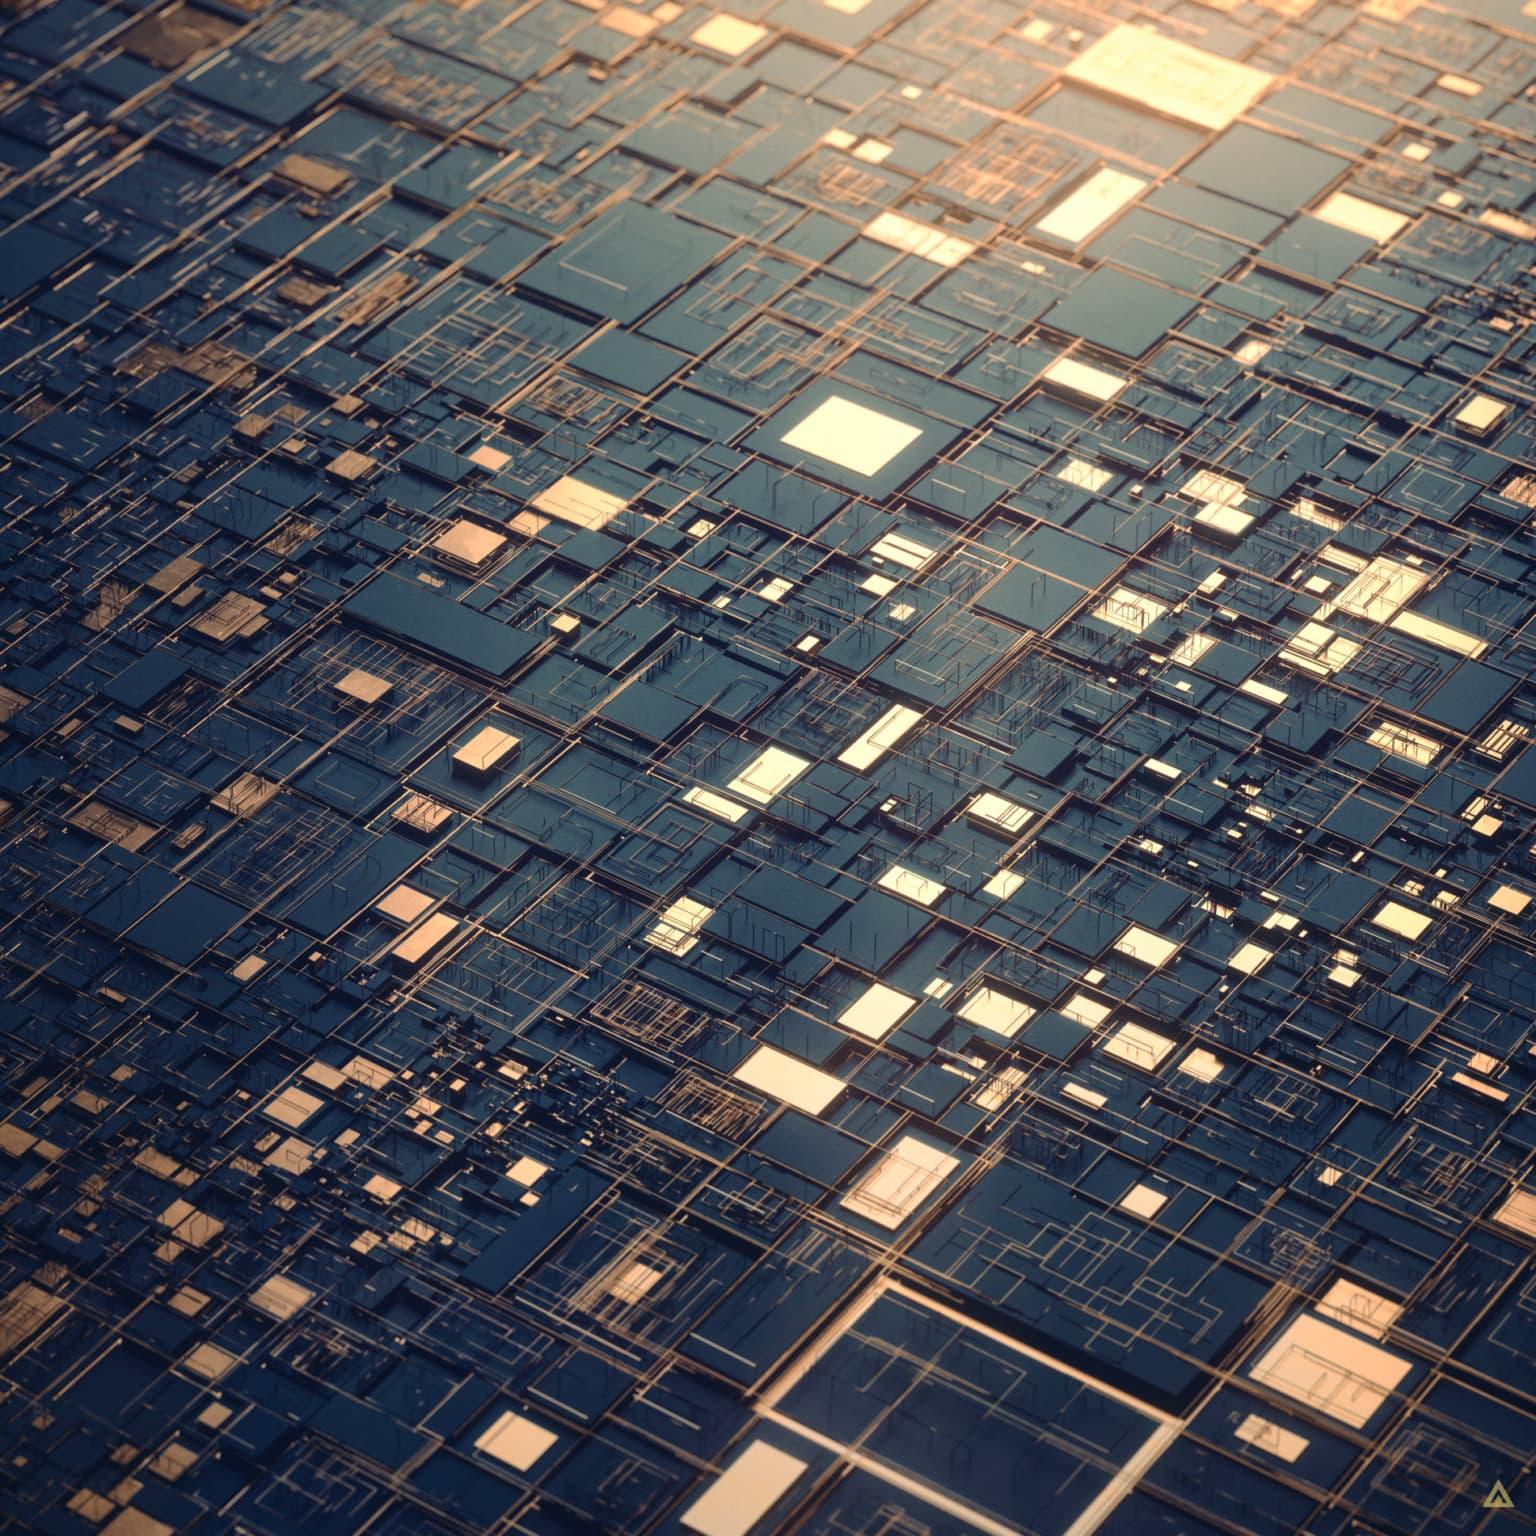 dimitris ladopoulos digital landscapes design